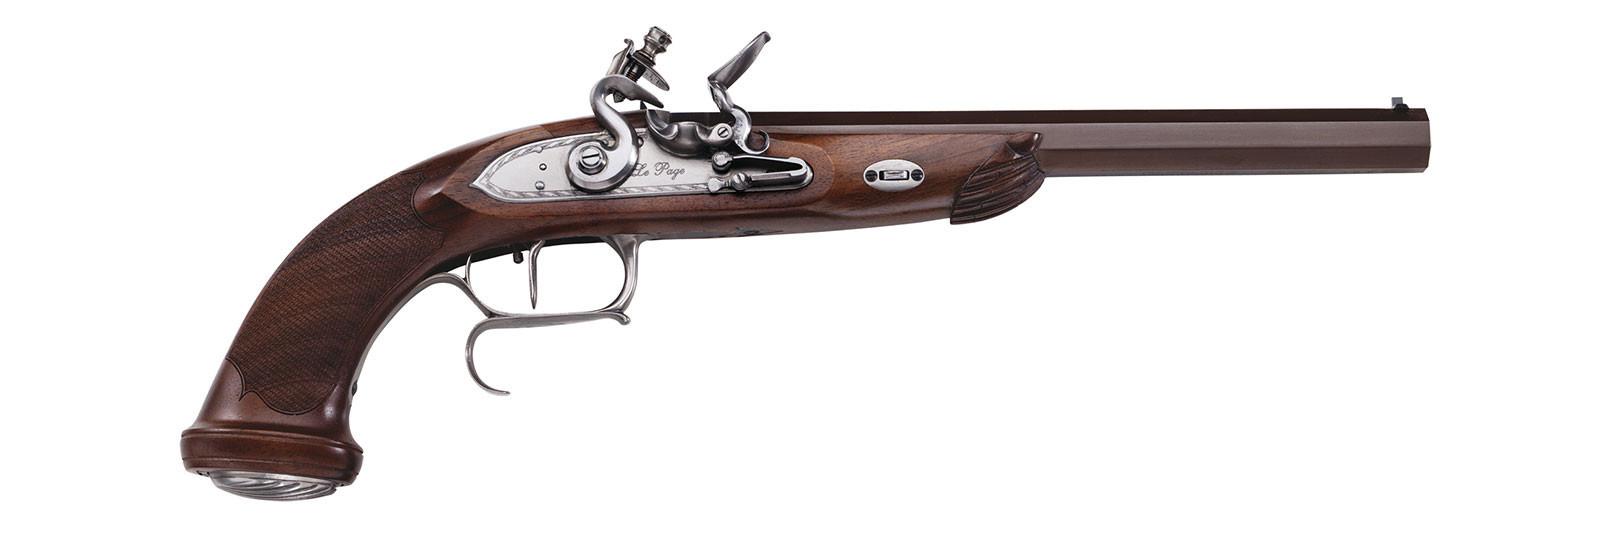 "Pistola Le Page ""Target"" a pietra focaia"